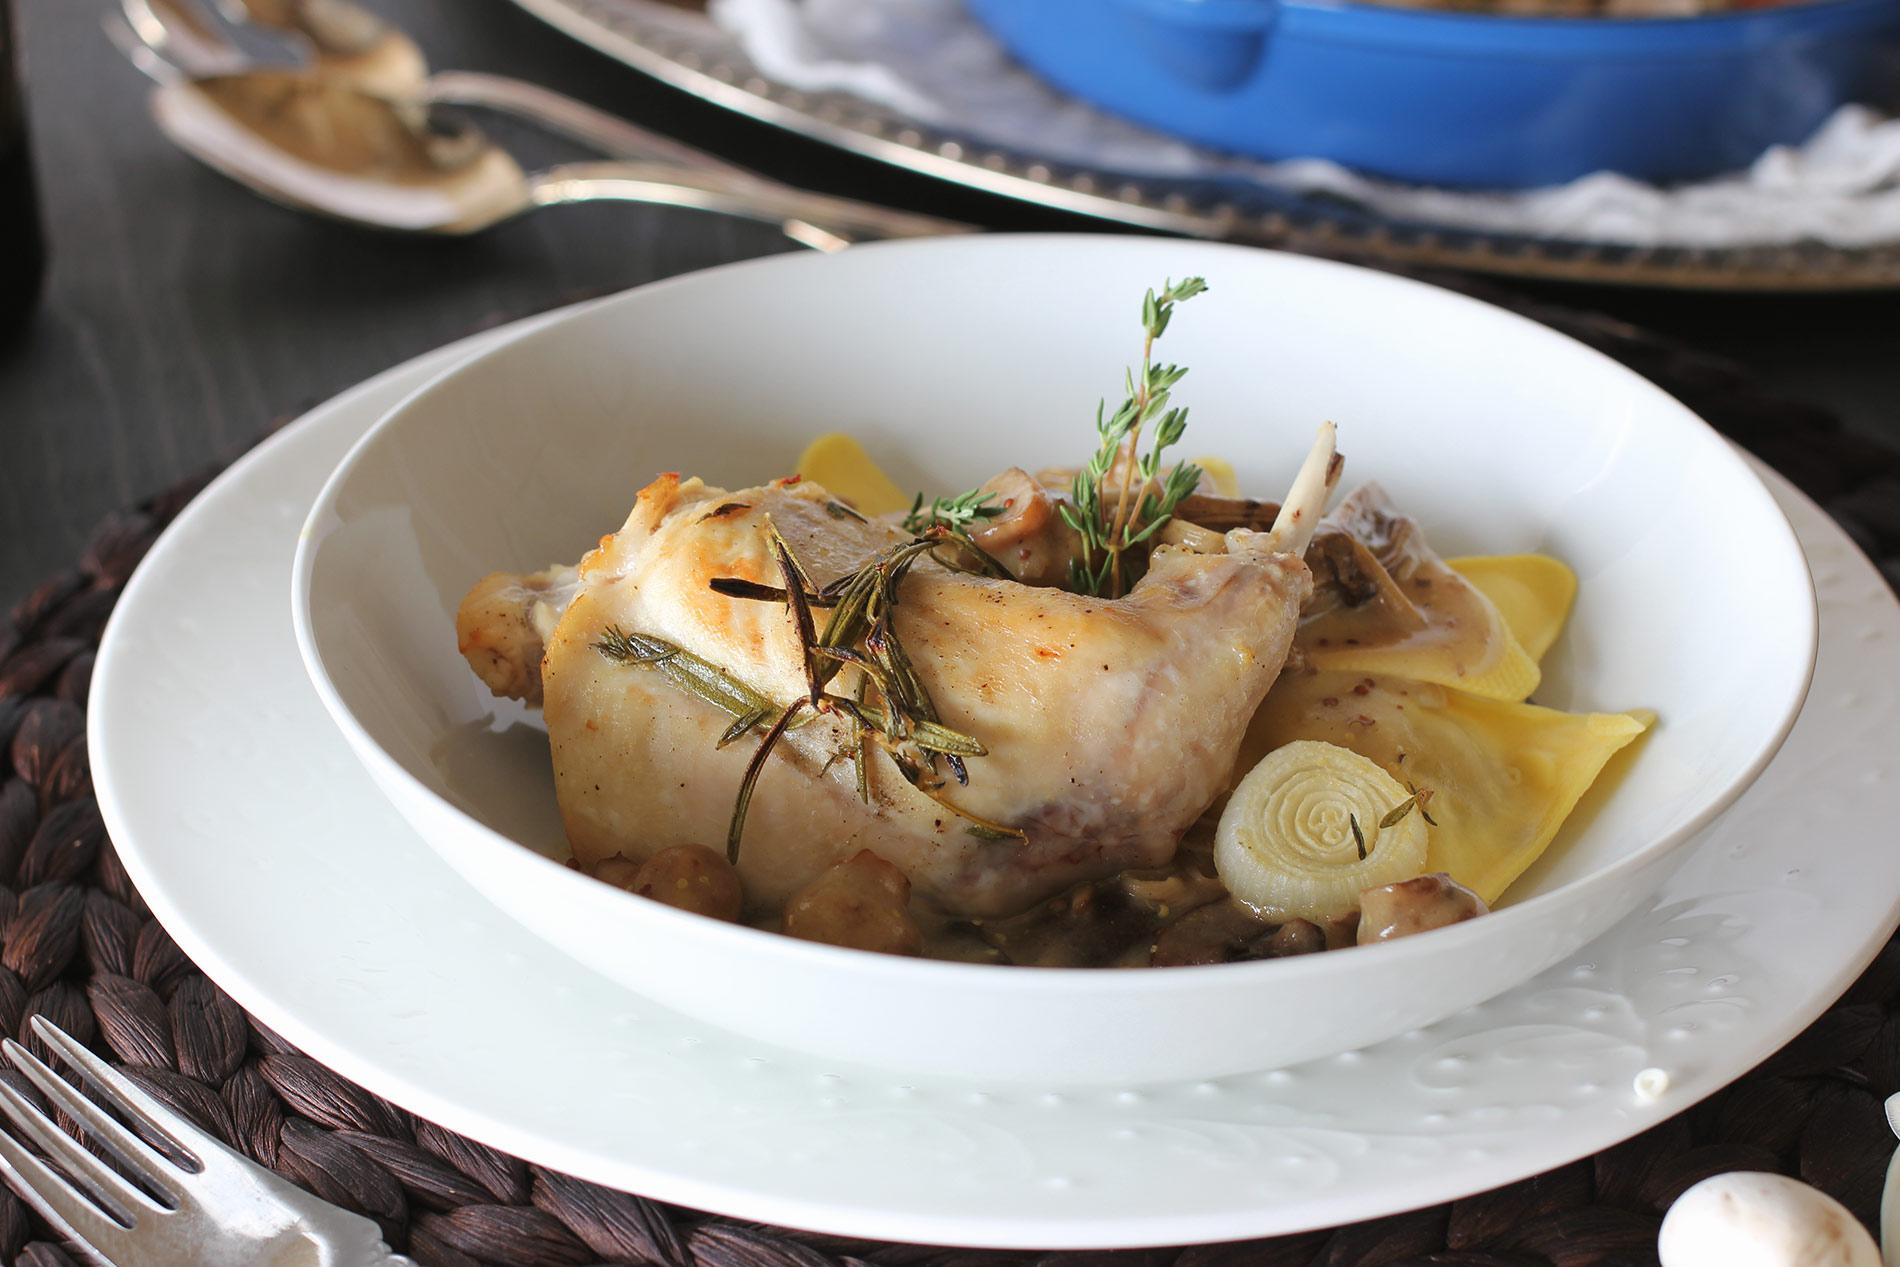 Braised Rabbit with Dijon Sauce